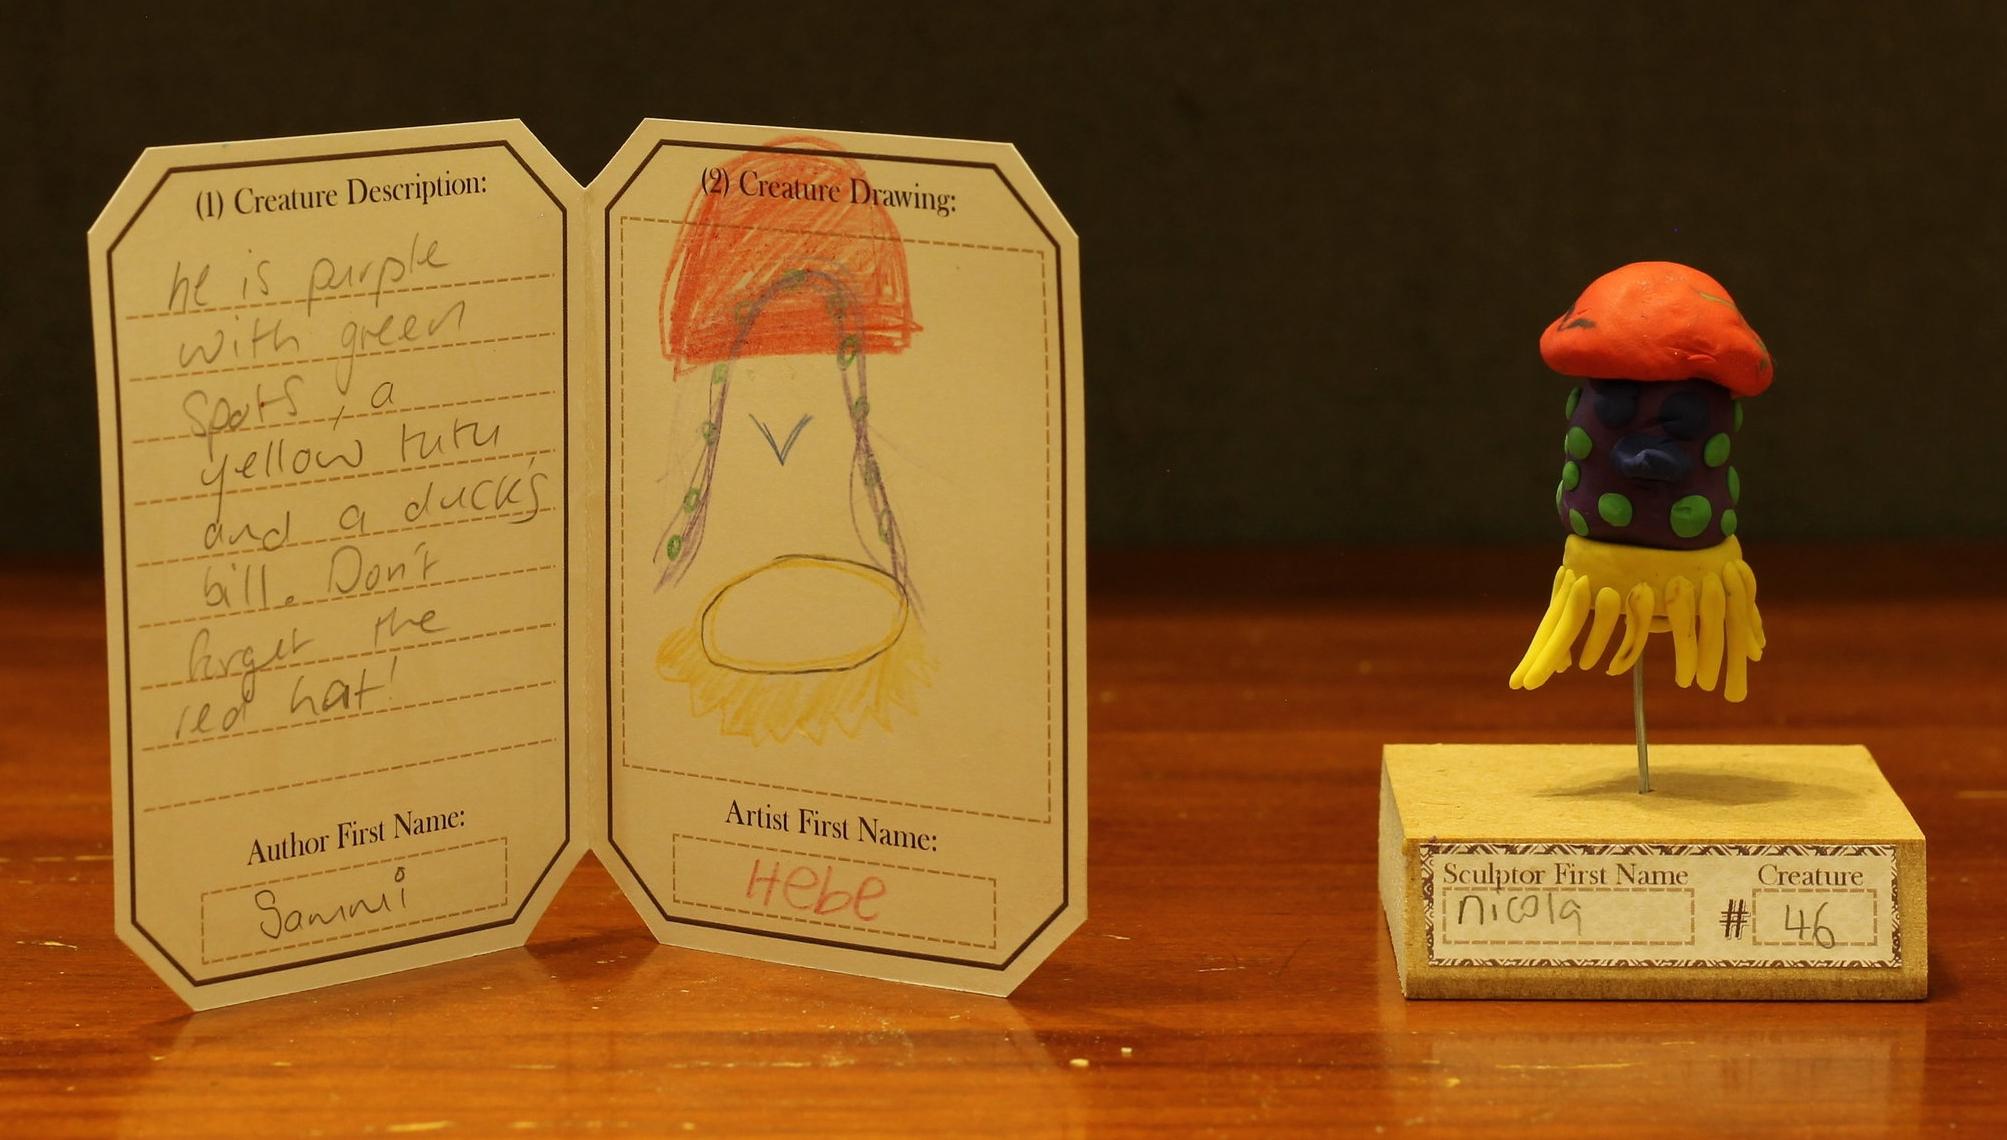 Example Creature: CC46. Author = Sammi, Artist = Hebe, Sculptor = Nicola